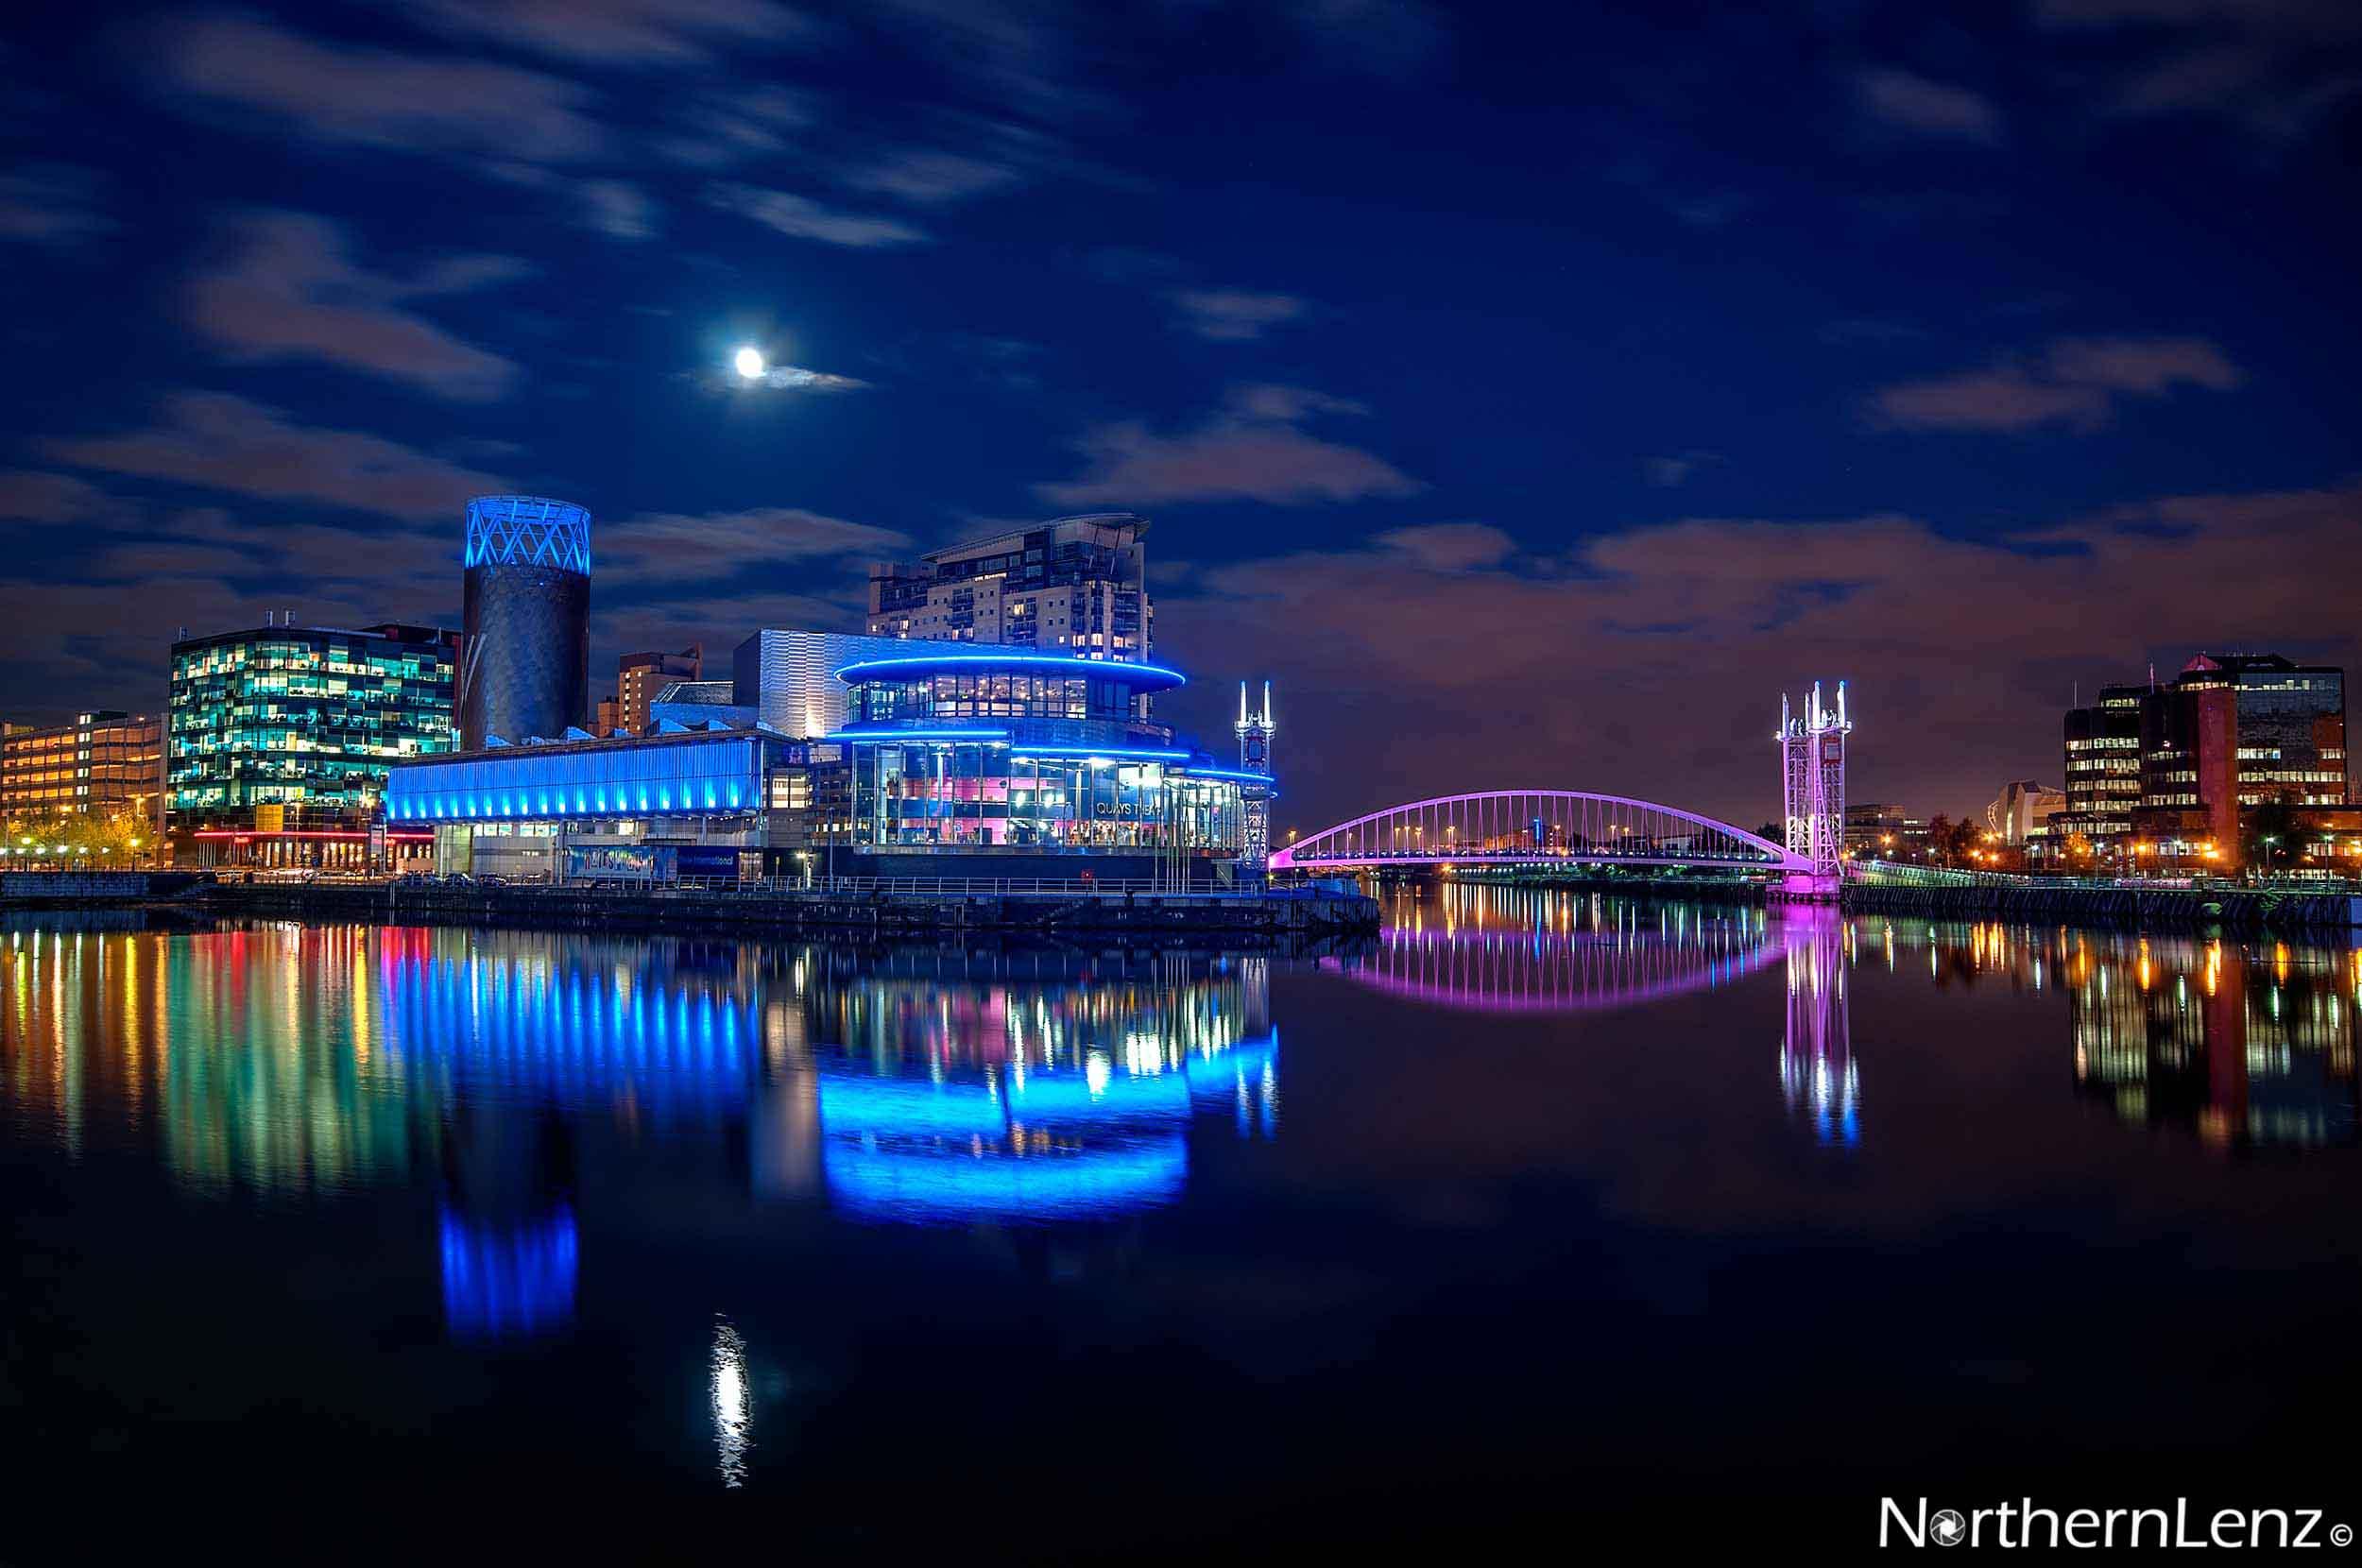 Moonlight over Media City, Salford  Image Ref: UA06